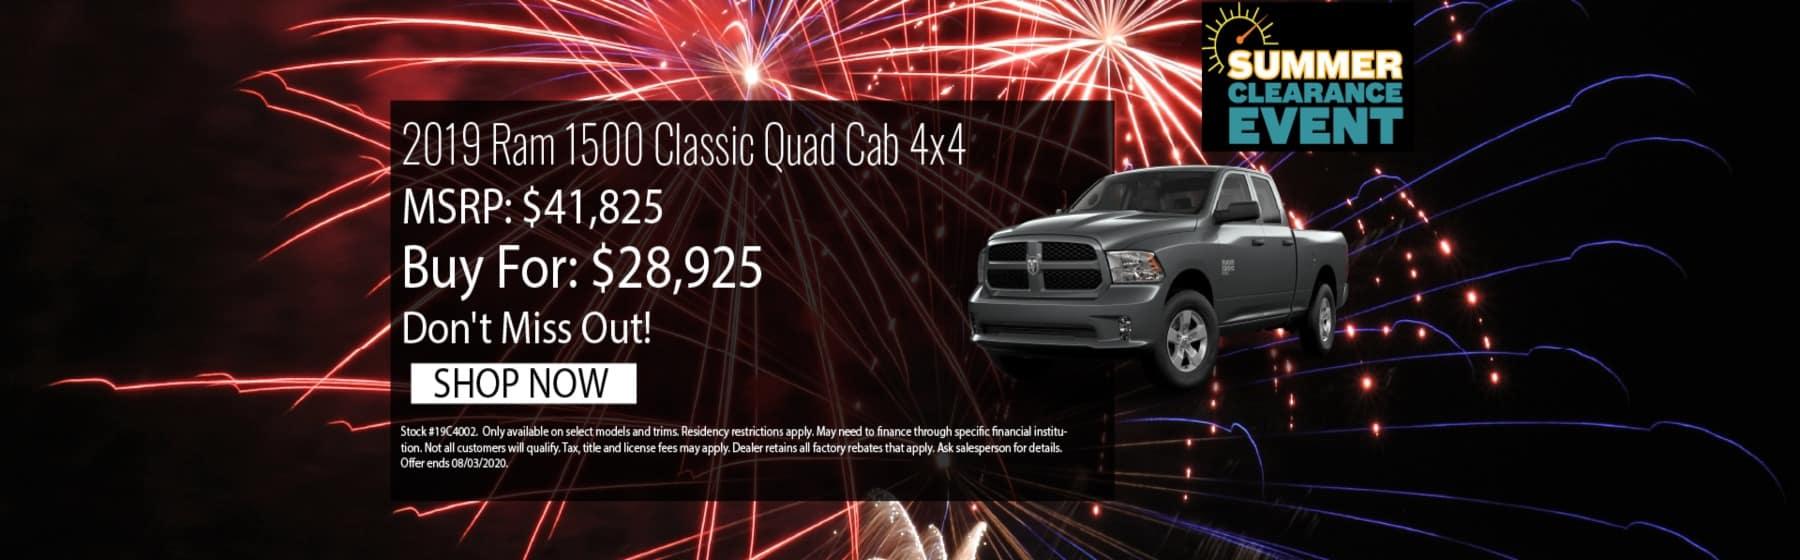 2019 RAM 1500 Classic July Offer